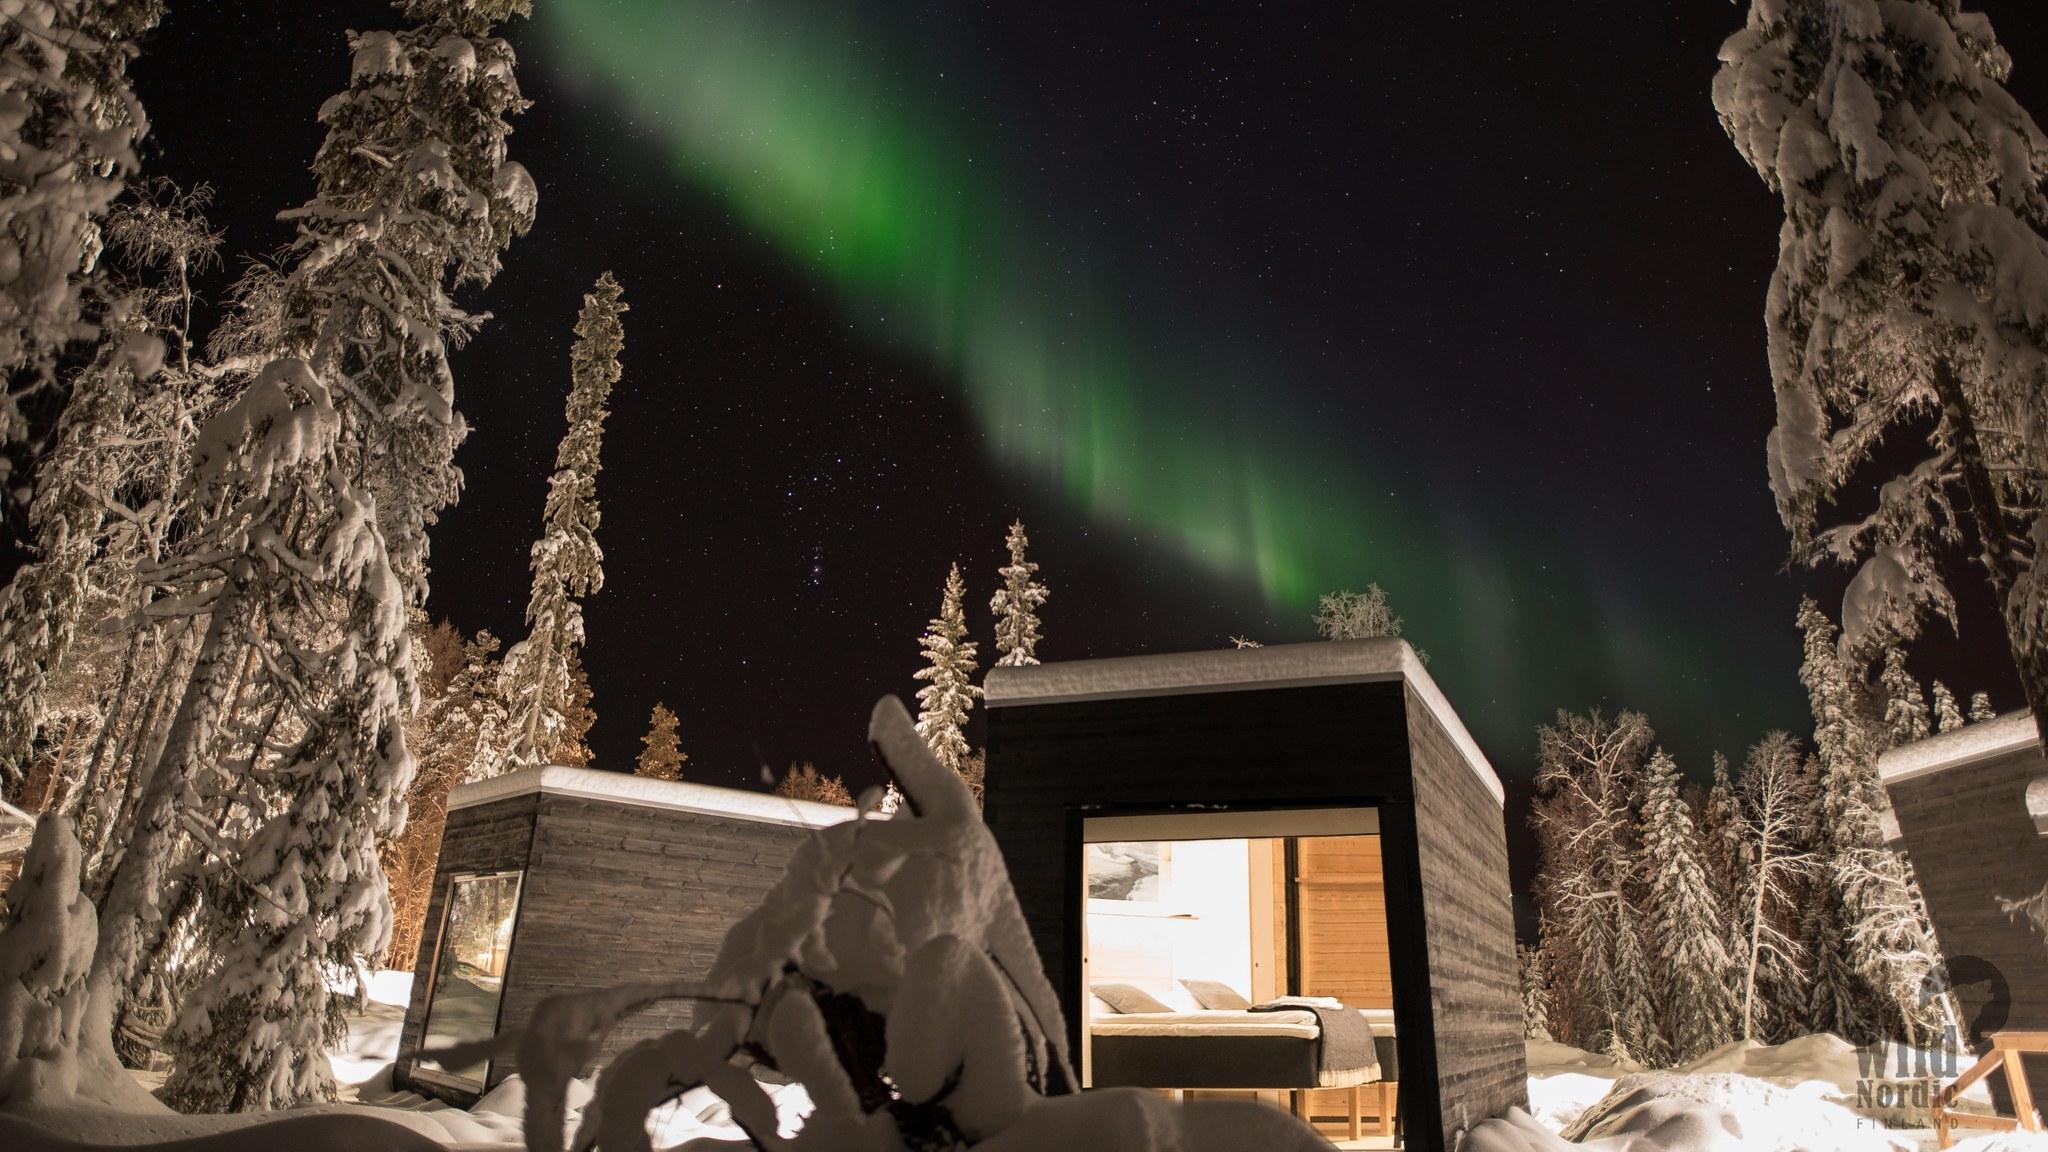 Panorama Hut with Northern Lights Visit Rovaniemi